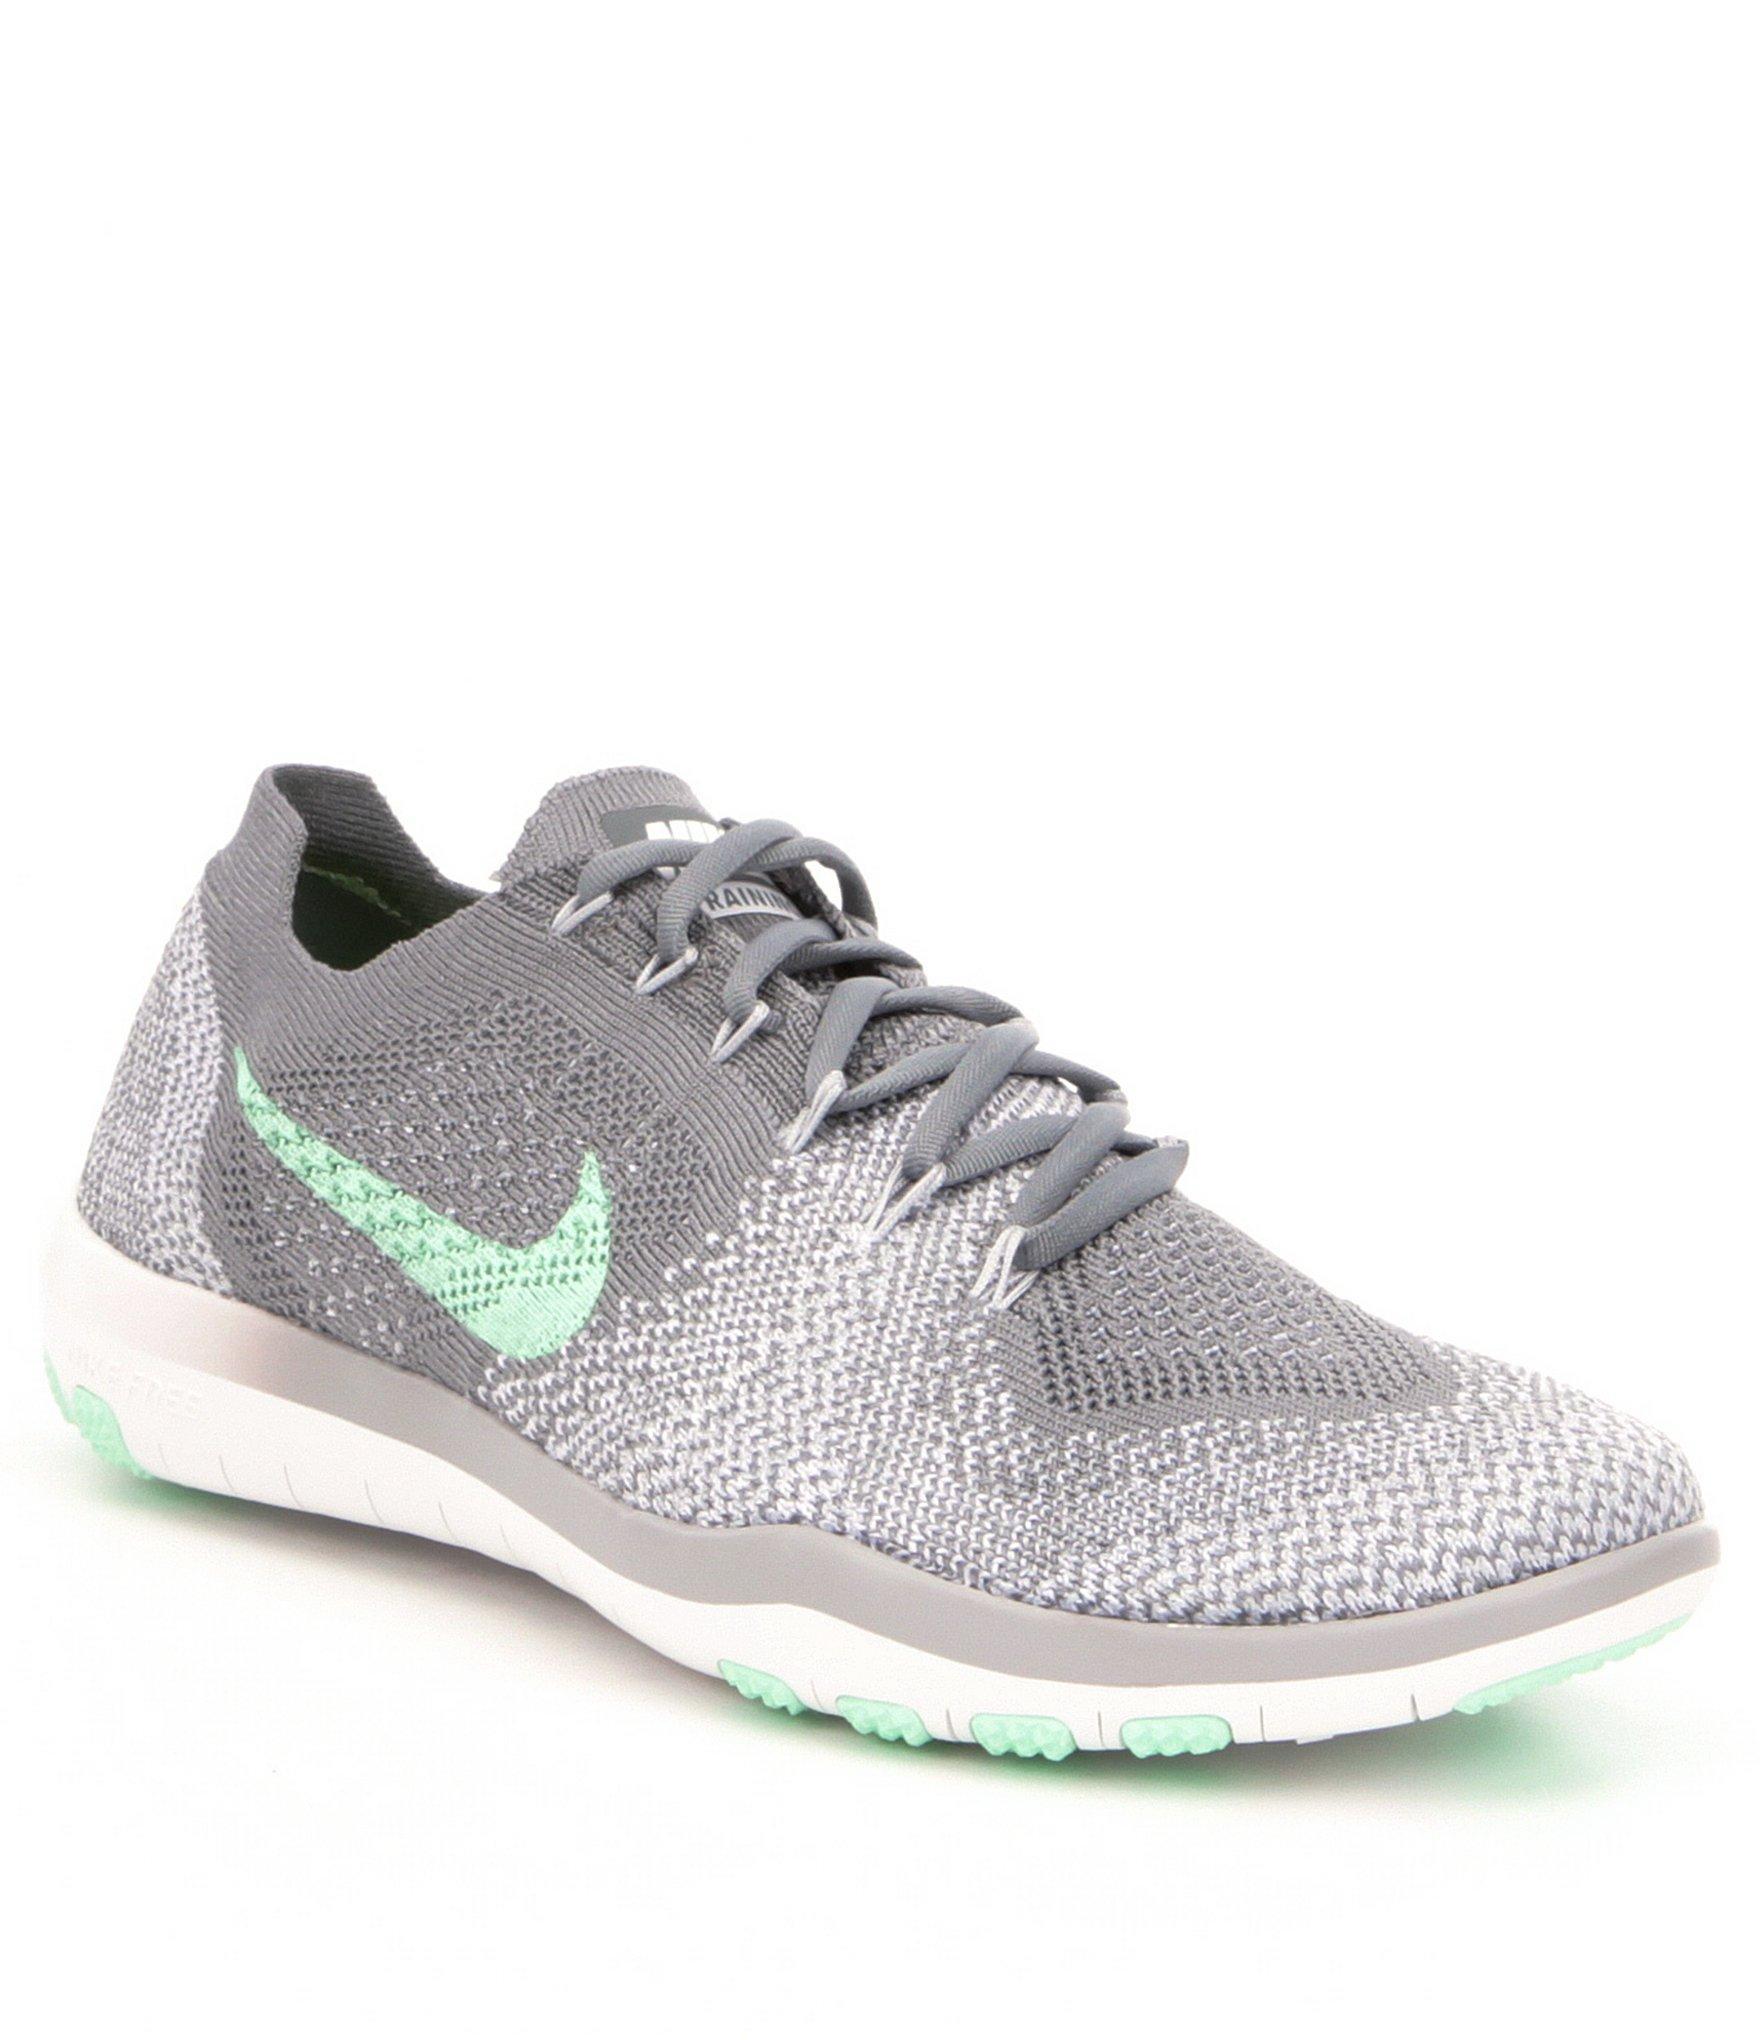 274bd4f46dd4 Lyst - Nike Women ́s Free Focus Flyknit 2 Training Shoes in Gray